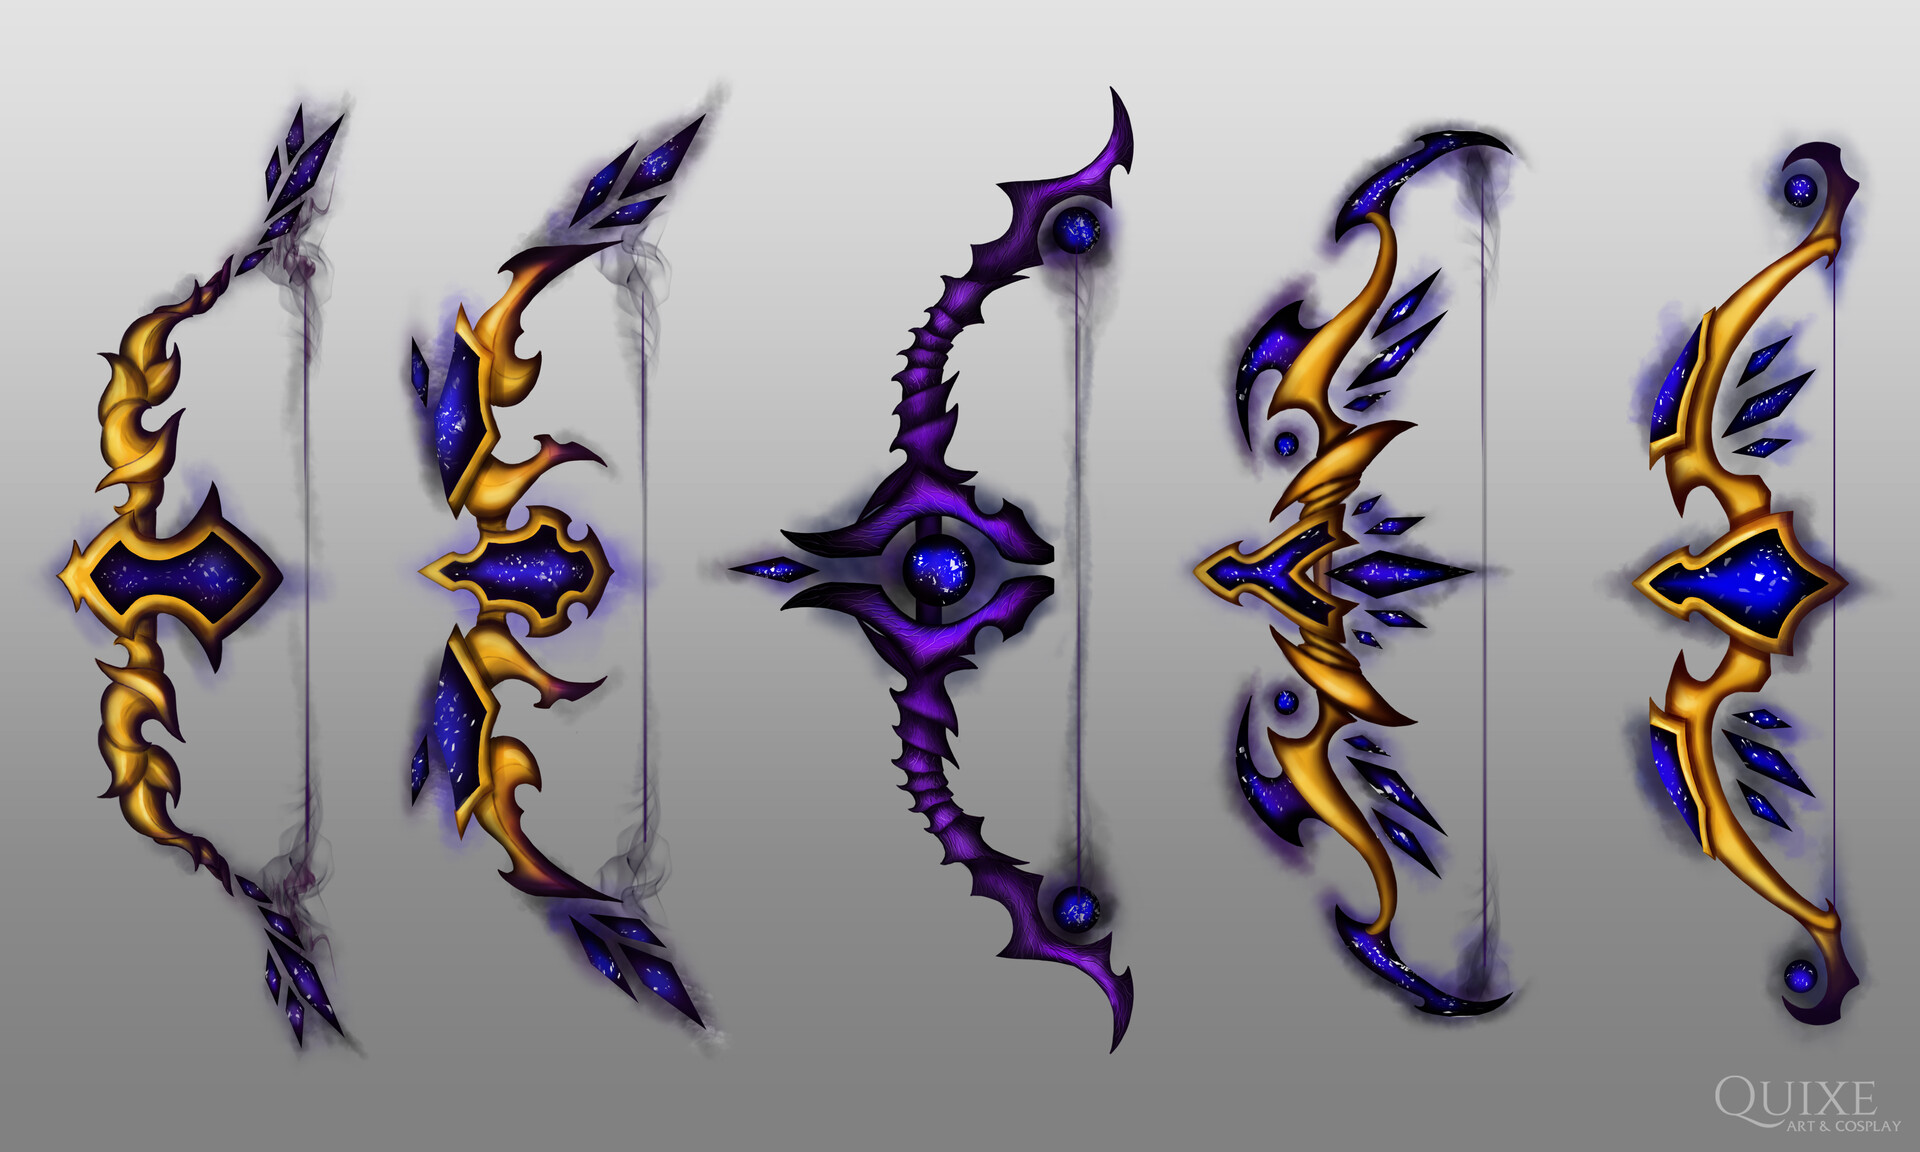 Artstation Void Elf Bow World Of Warcraft Murat Bayer Duskwatch adjudicator's chestplate/ breastplate of kel'balor tabard: artstation void elf bow world of